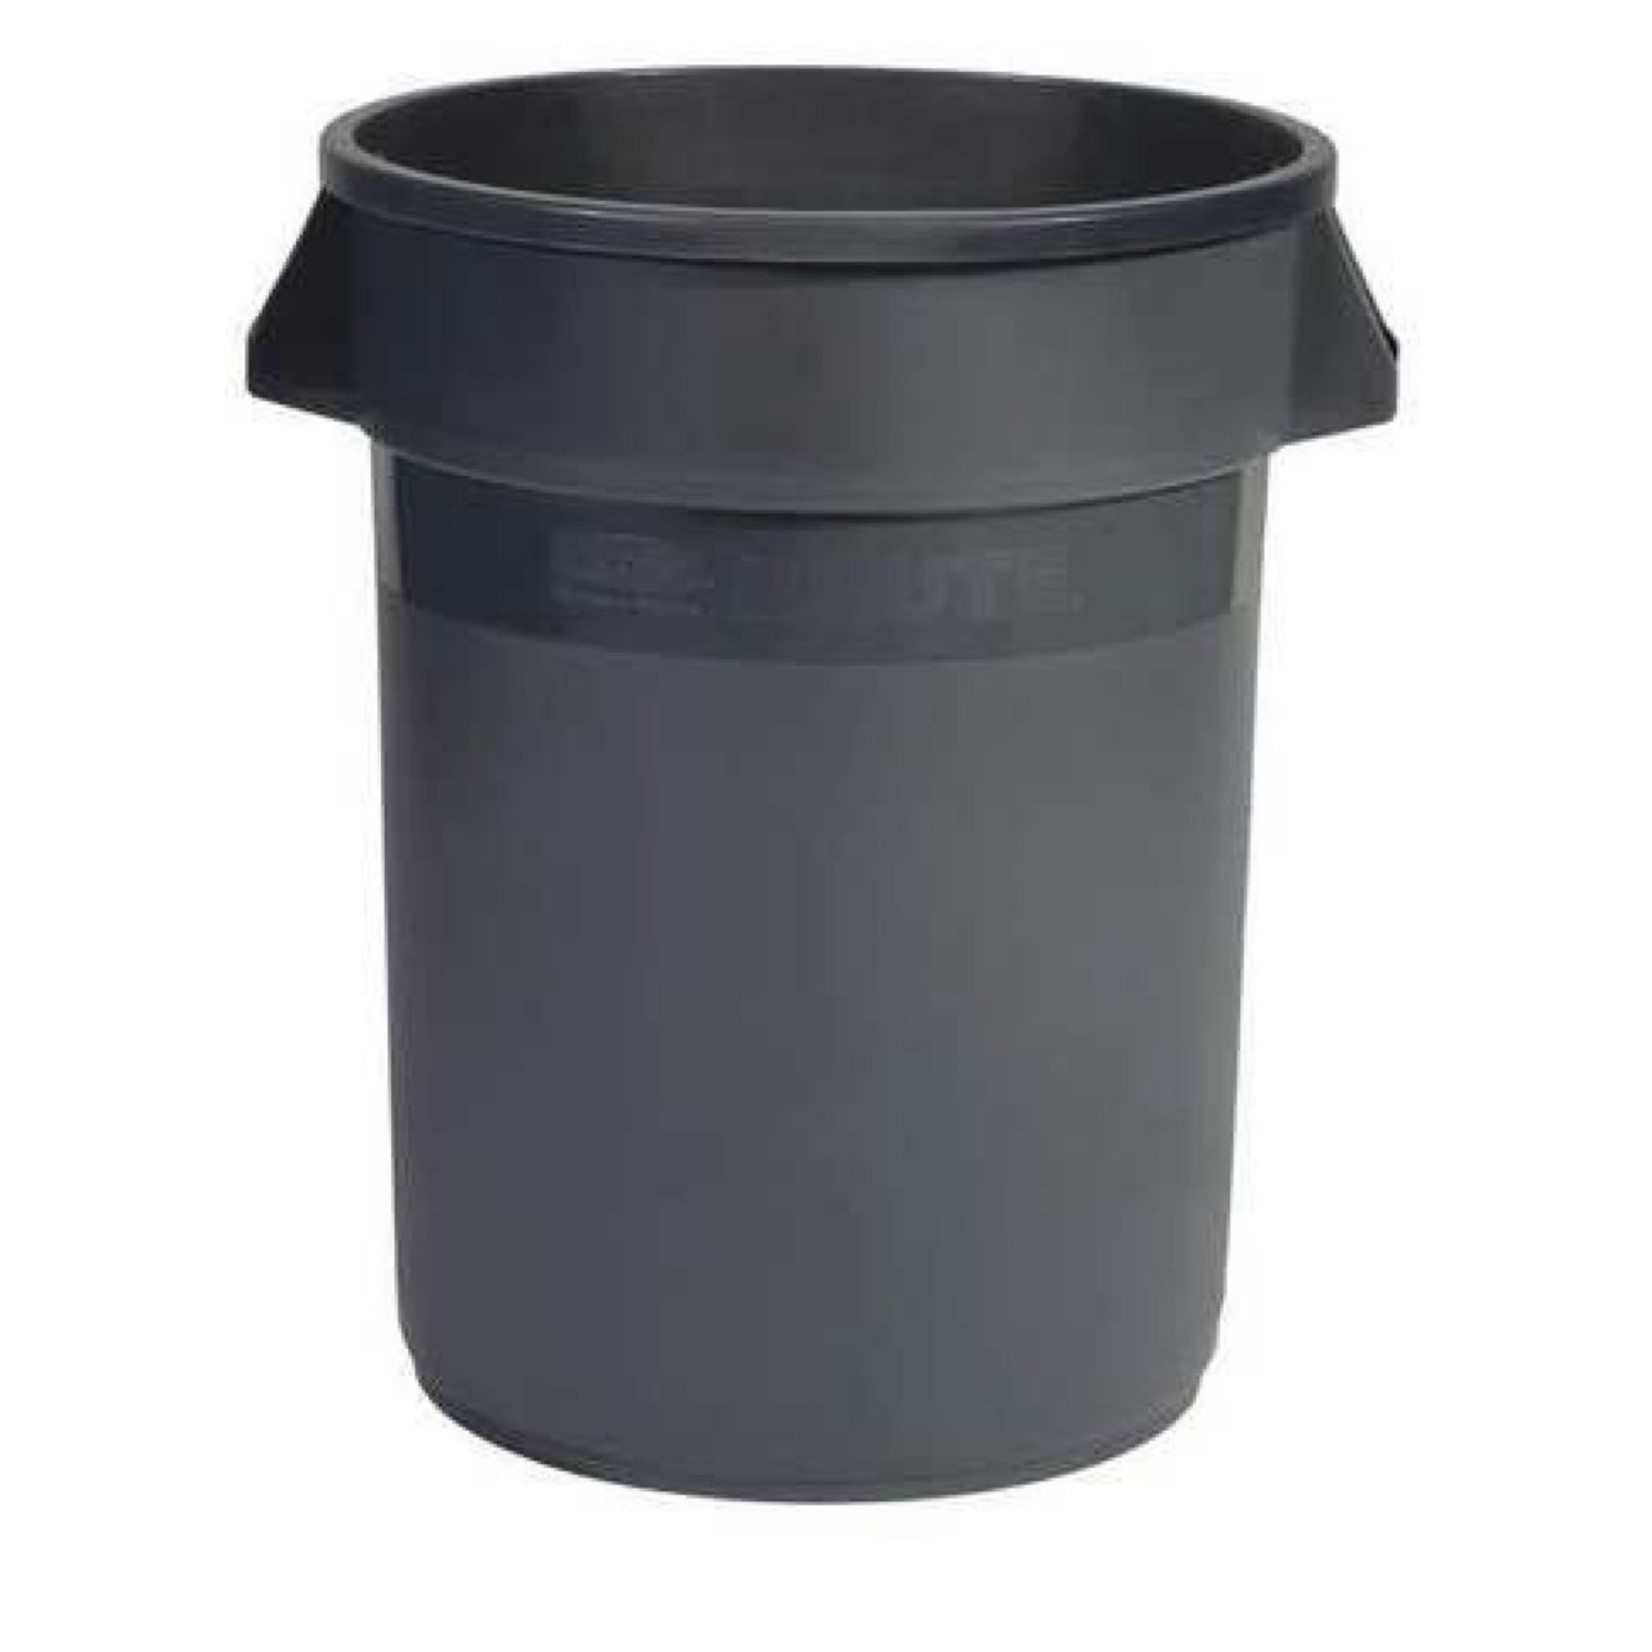 10112 Rubbermaid Brute 32Gal Trash Can